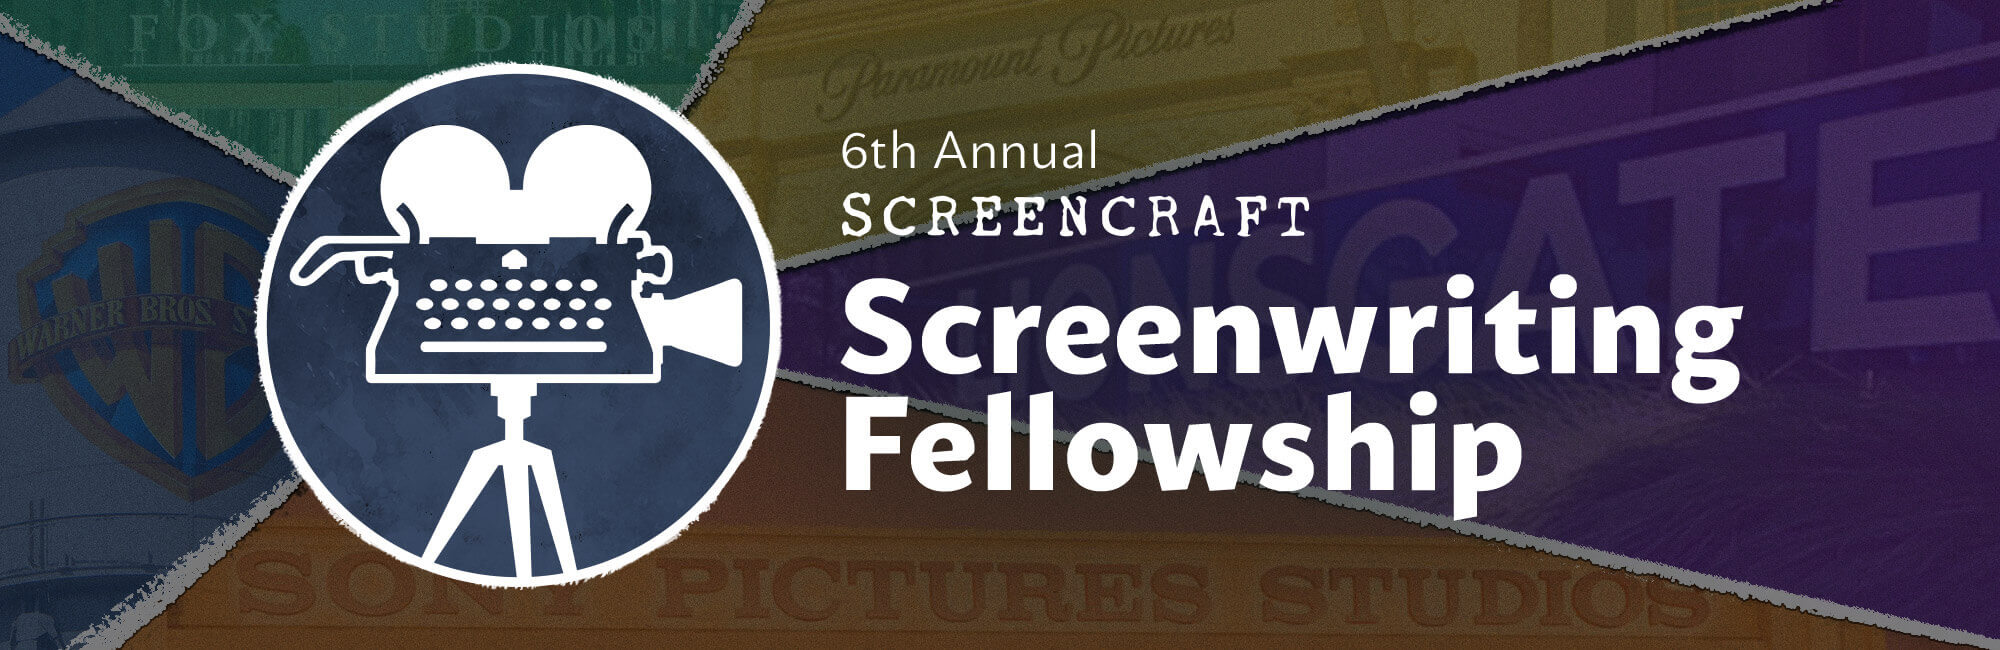 2019-ScreenCraft-Fellowship-2000x650-01b.jpg